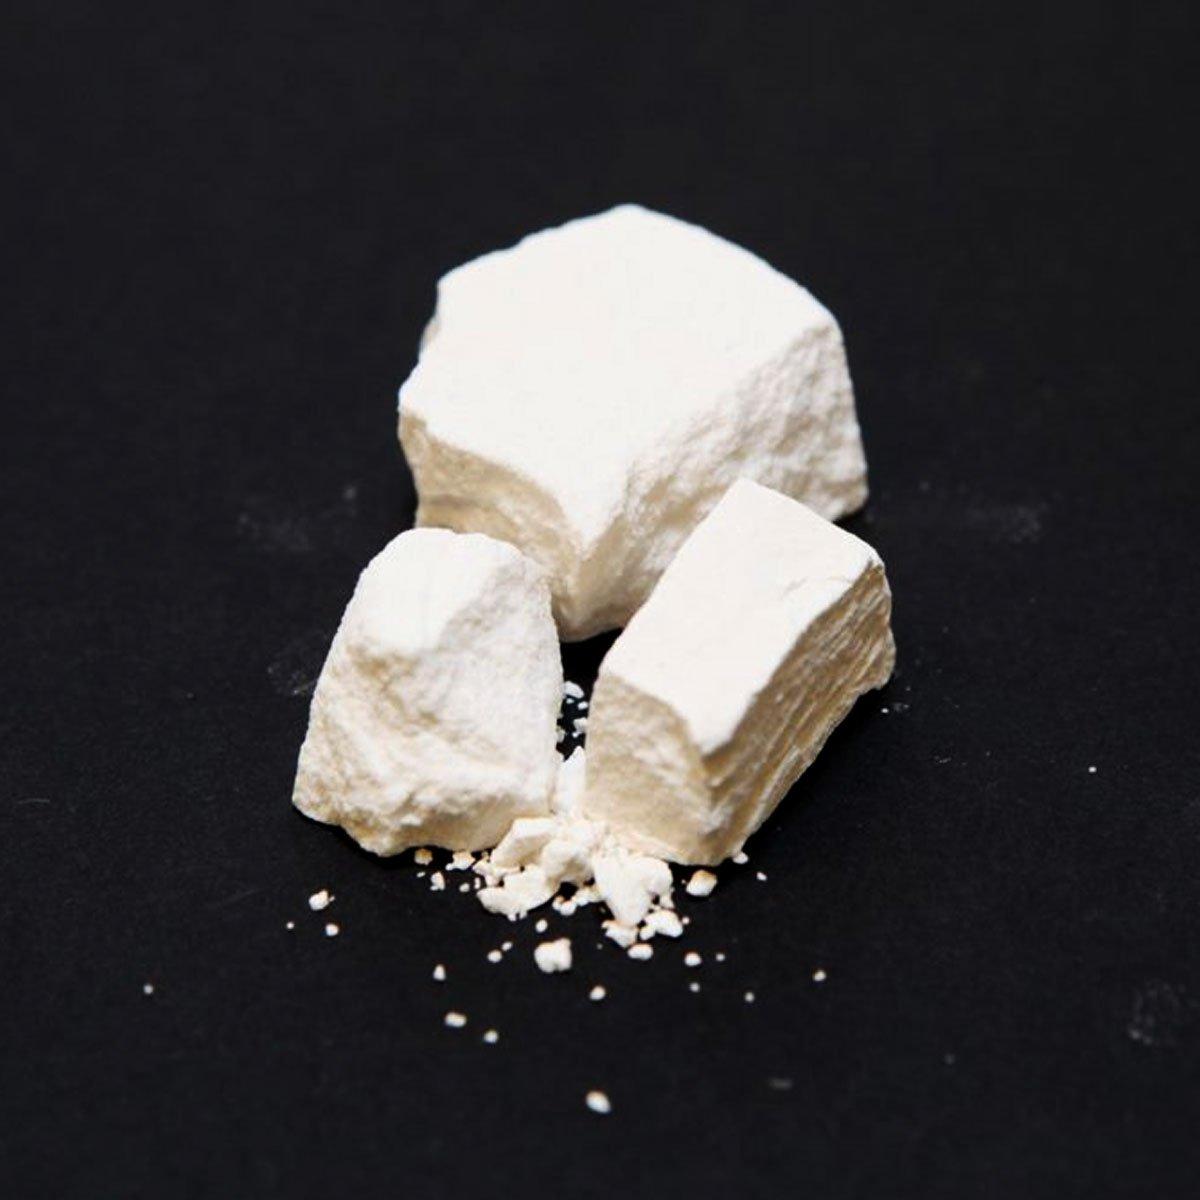 Heroin - Dope, Buy Heroin Online, Where to Buy Heroin, How to buy Heroin, Buy Research Chemicals Online